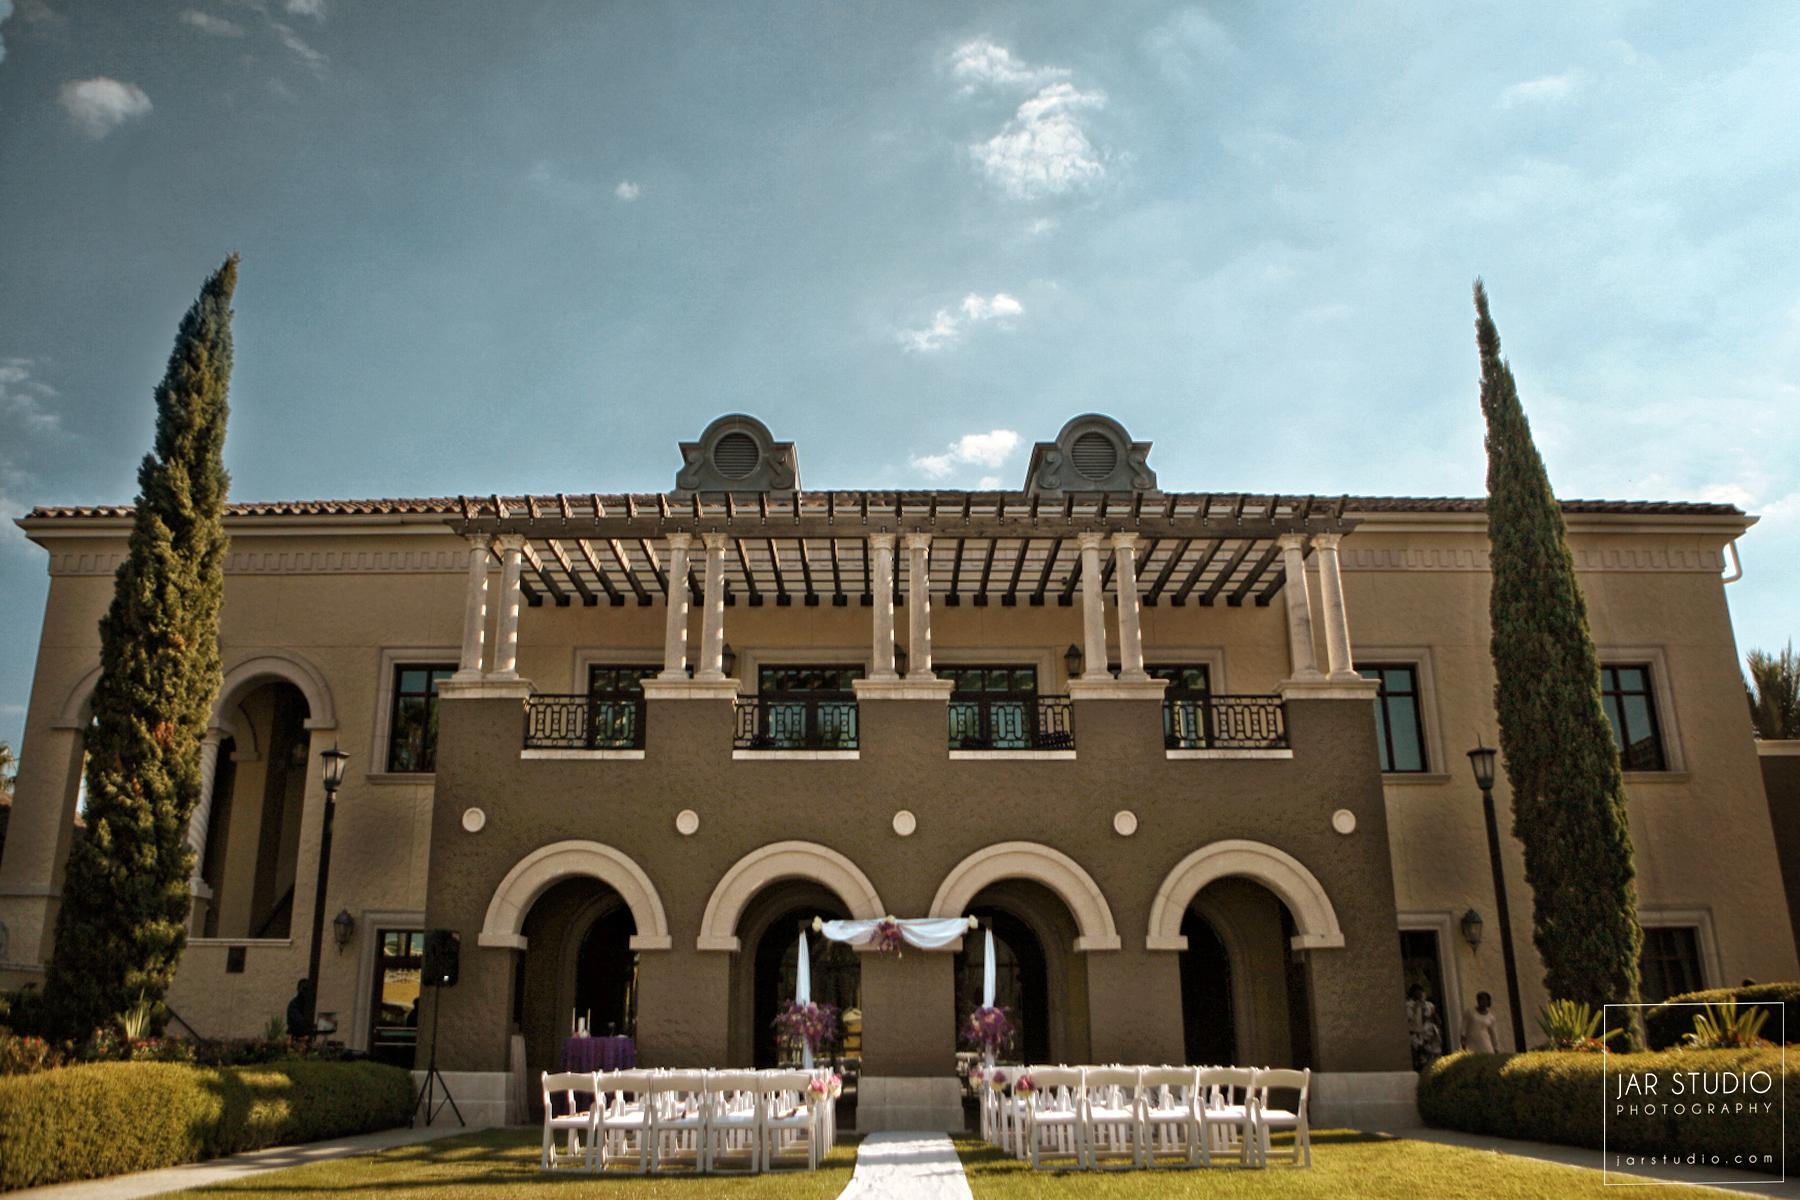 09-Hilton-Grand-Vacations-at-Tuscany-Village- destination-wedding-event-photographer-jarstudio.JPG